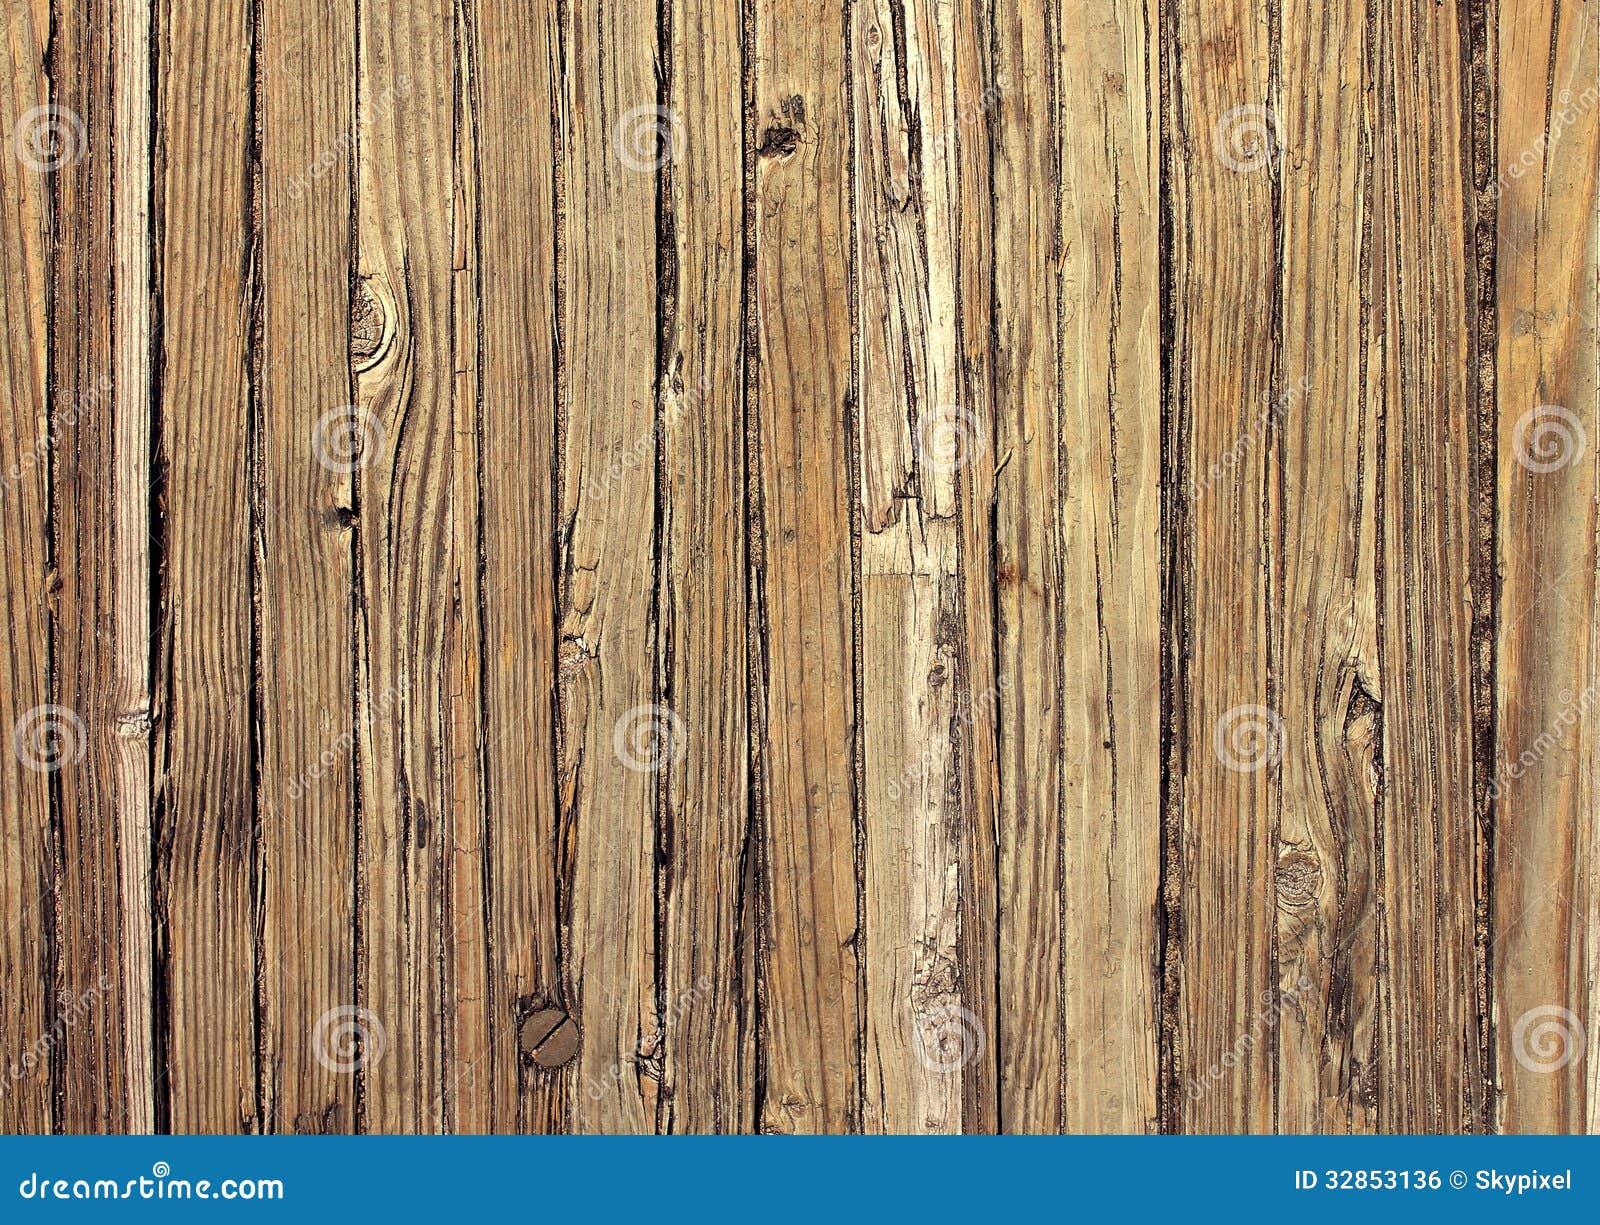 Old weathered wood background royalty free stock image